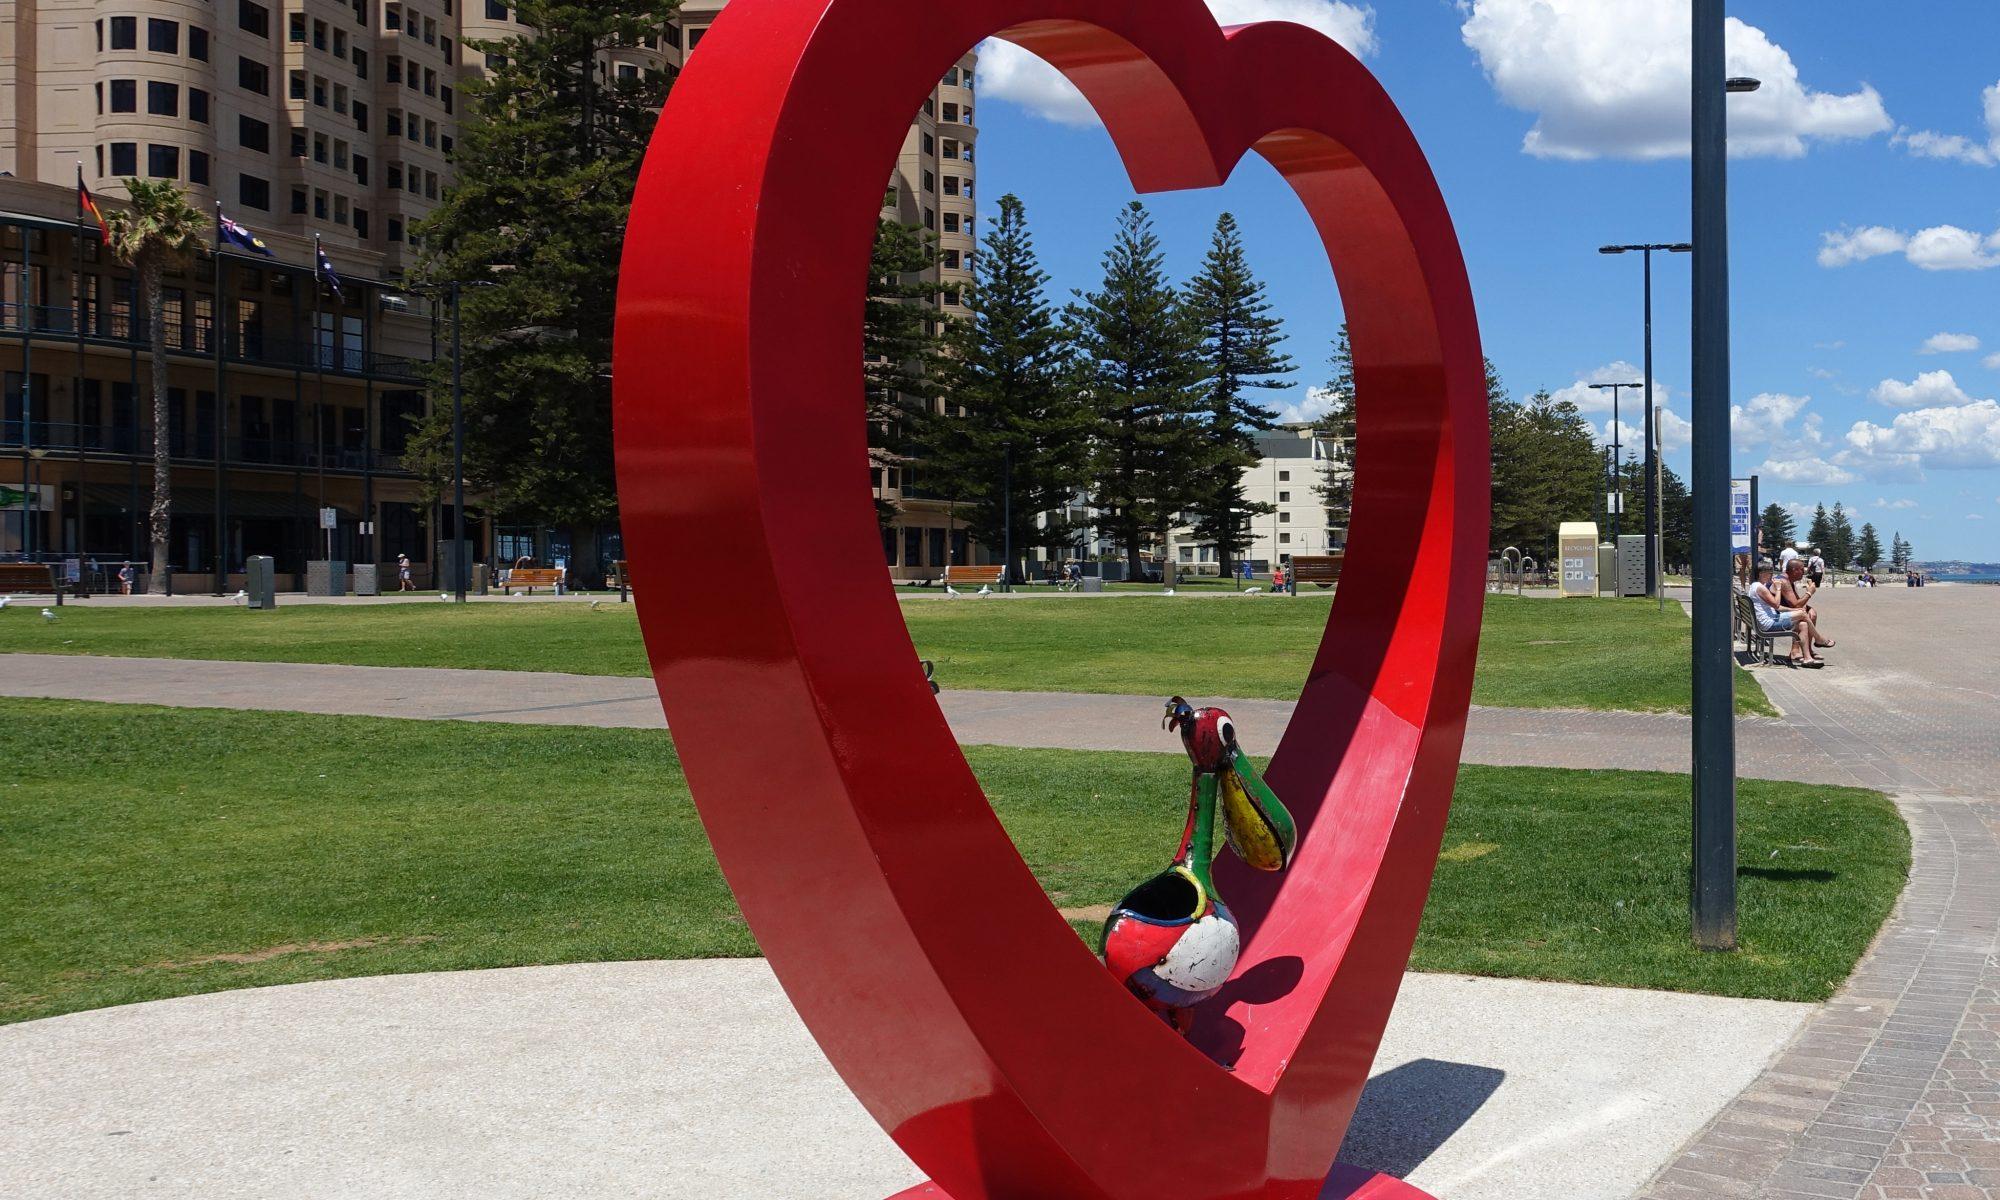 Percival on heart sculpture